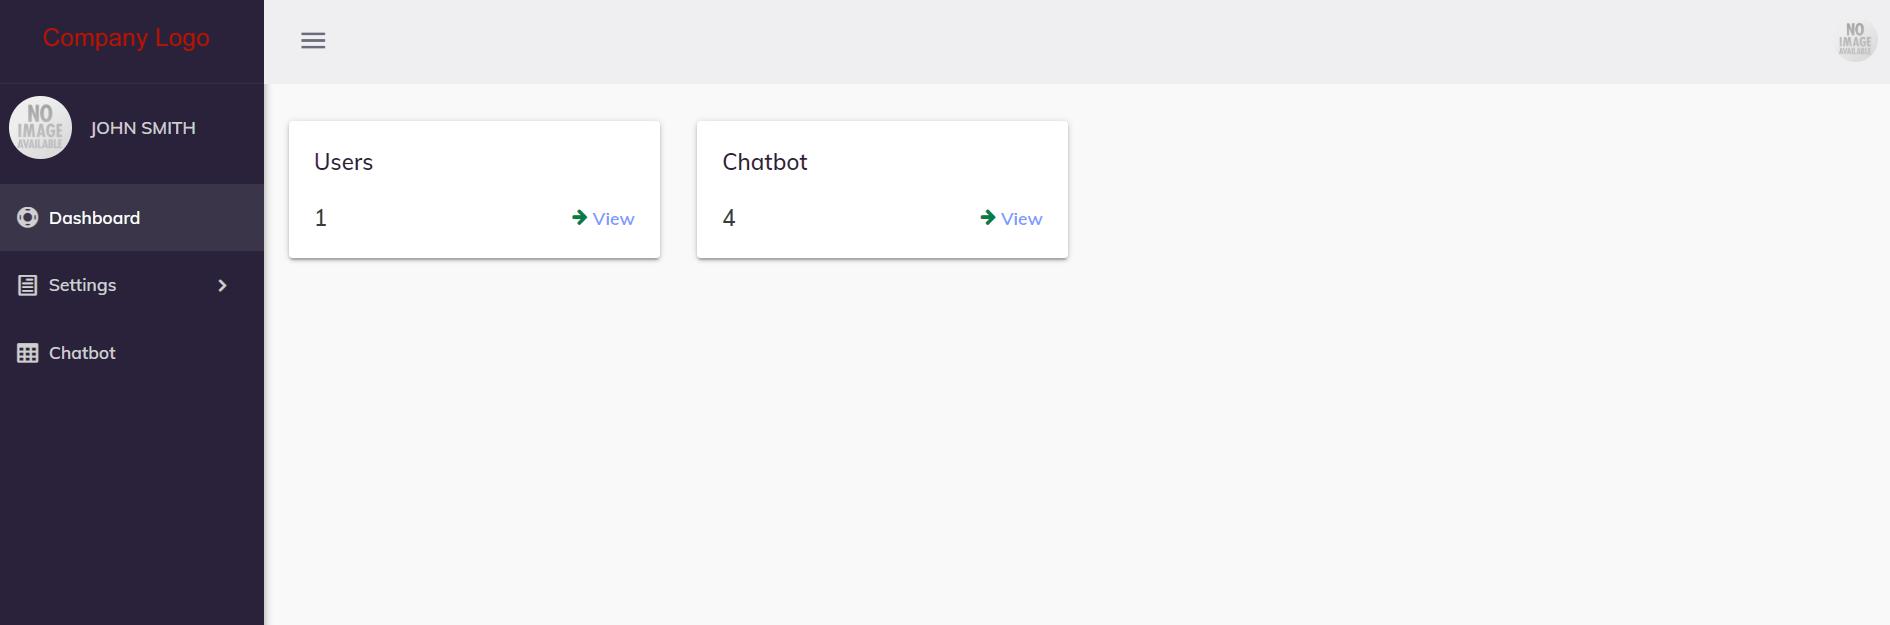 Chatbot in PHP MySQL Codeigniter Framework